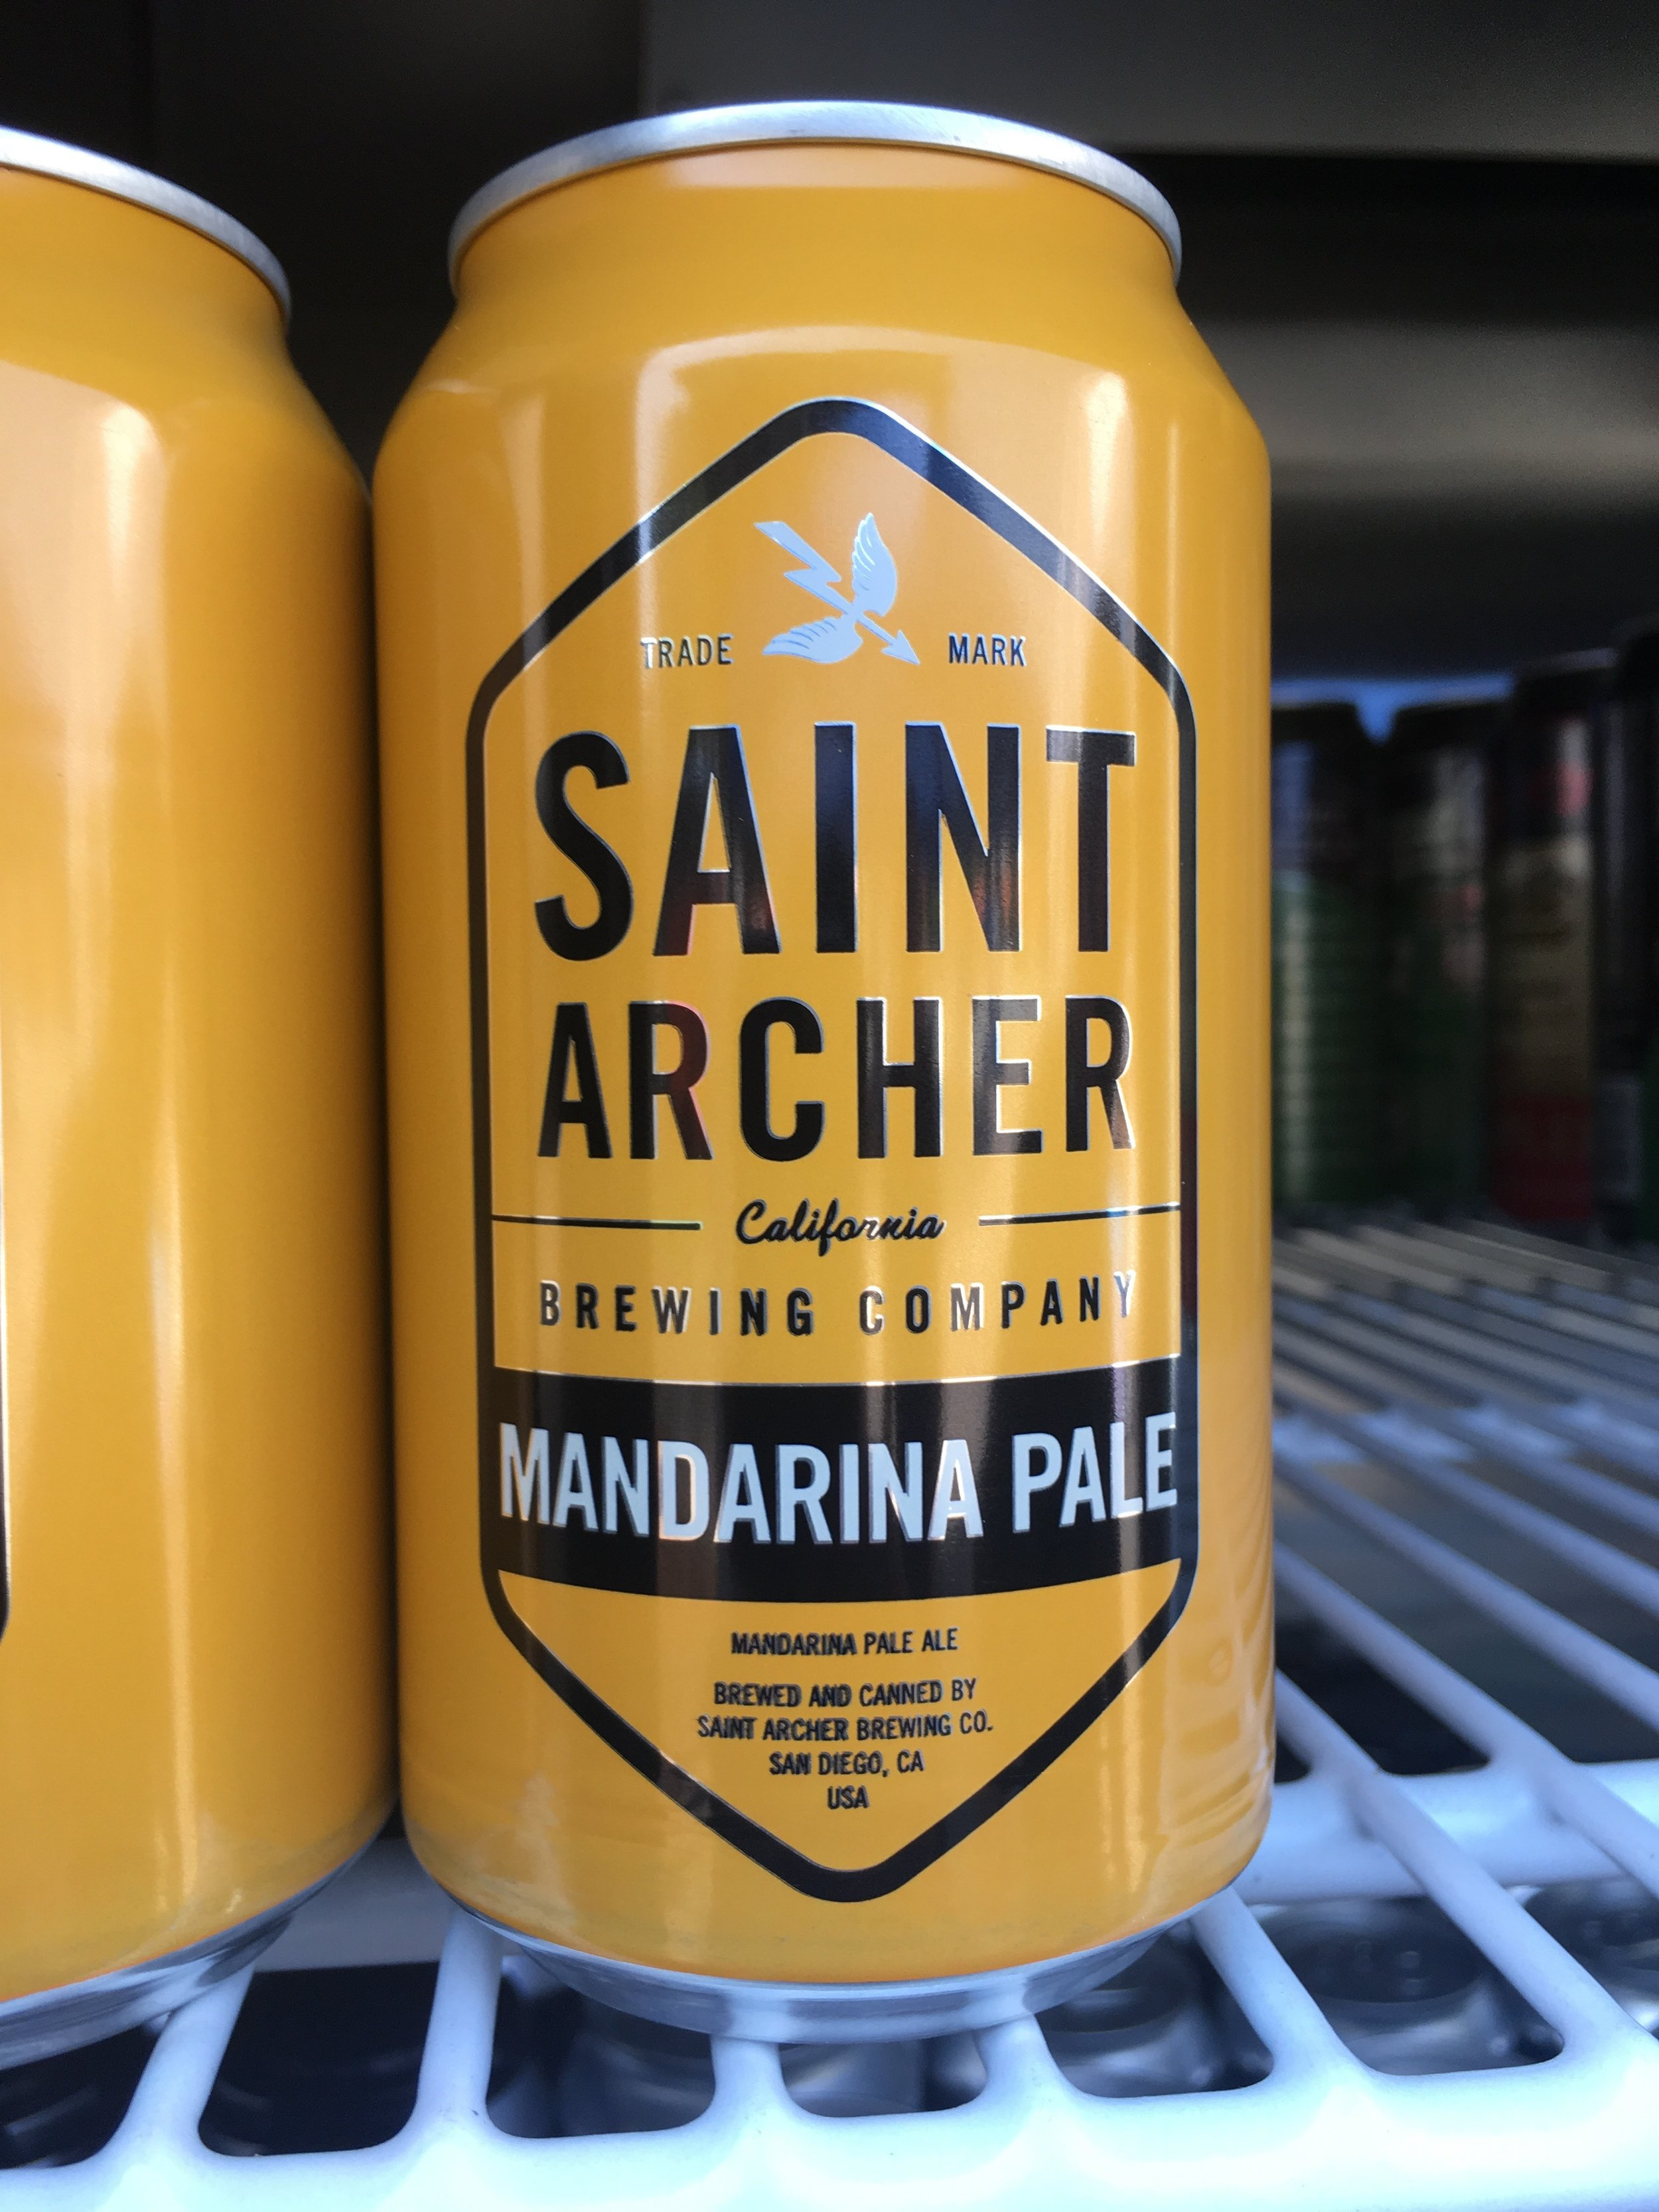 Saint Archer Brewery - Mandarina Pale Ale